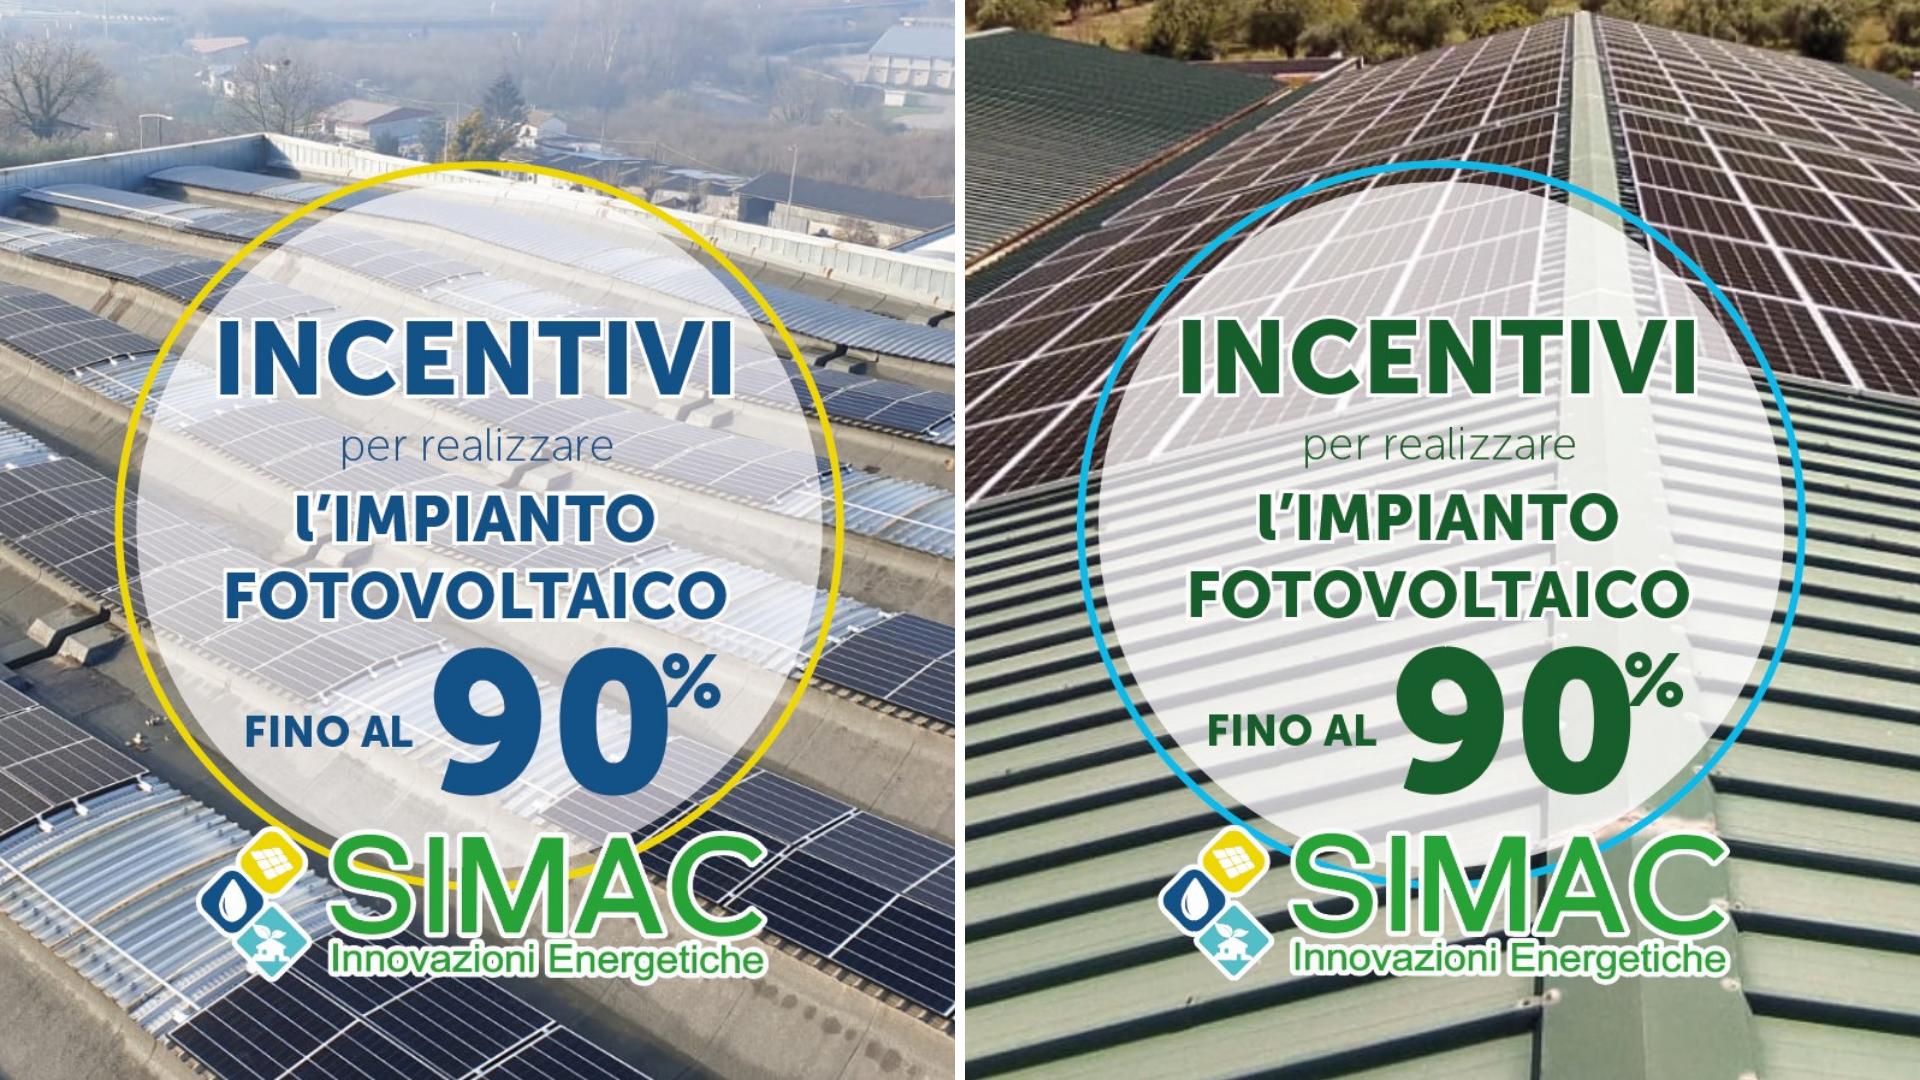 Simac Solar - incentivi per le imprese